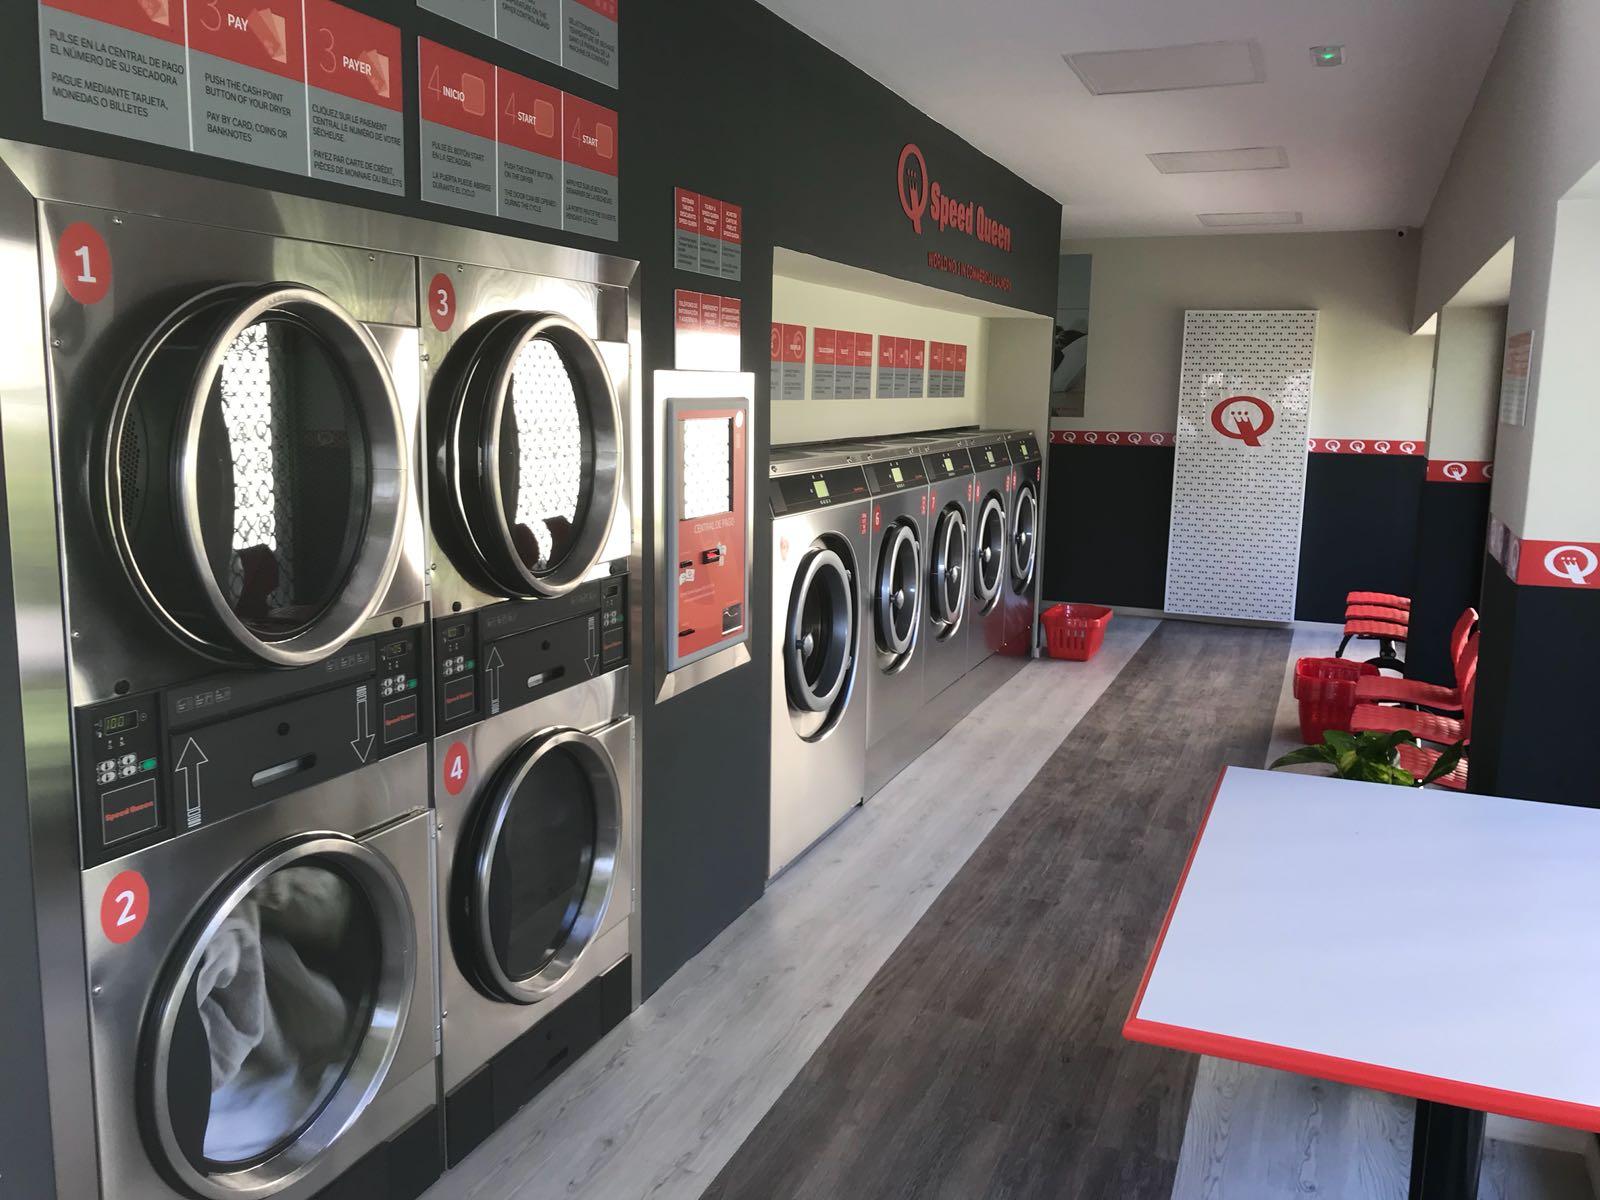 paket usaha laundry koin